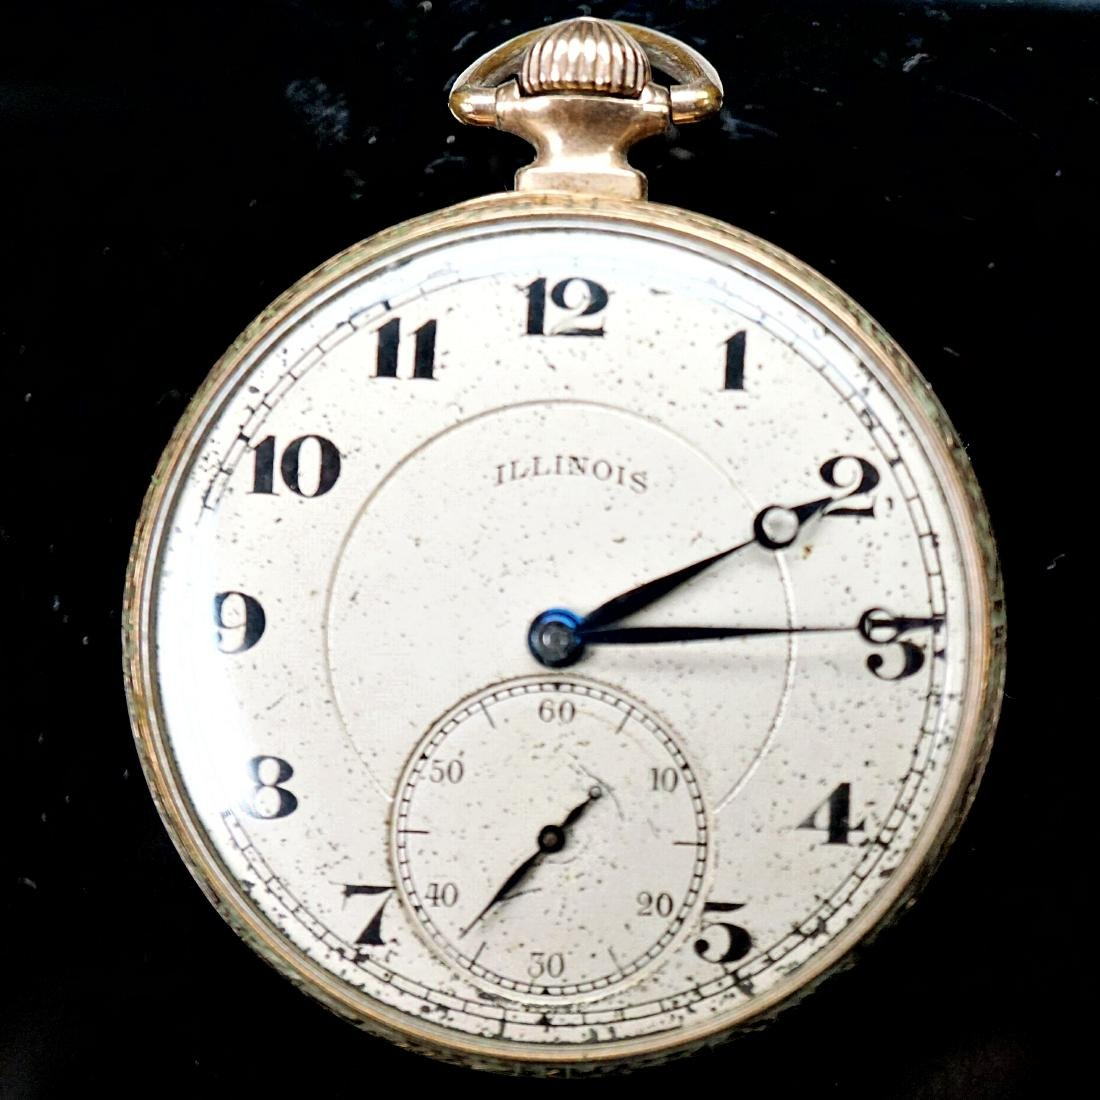 Illinois Pocket Watch 25 Year Case 12s